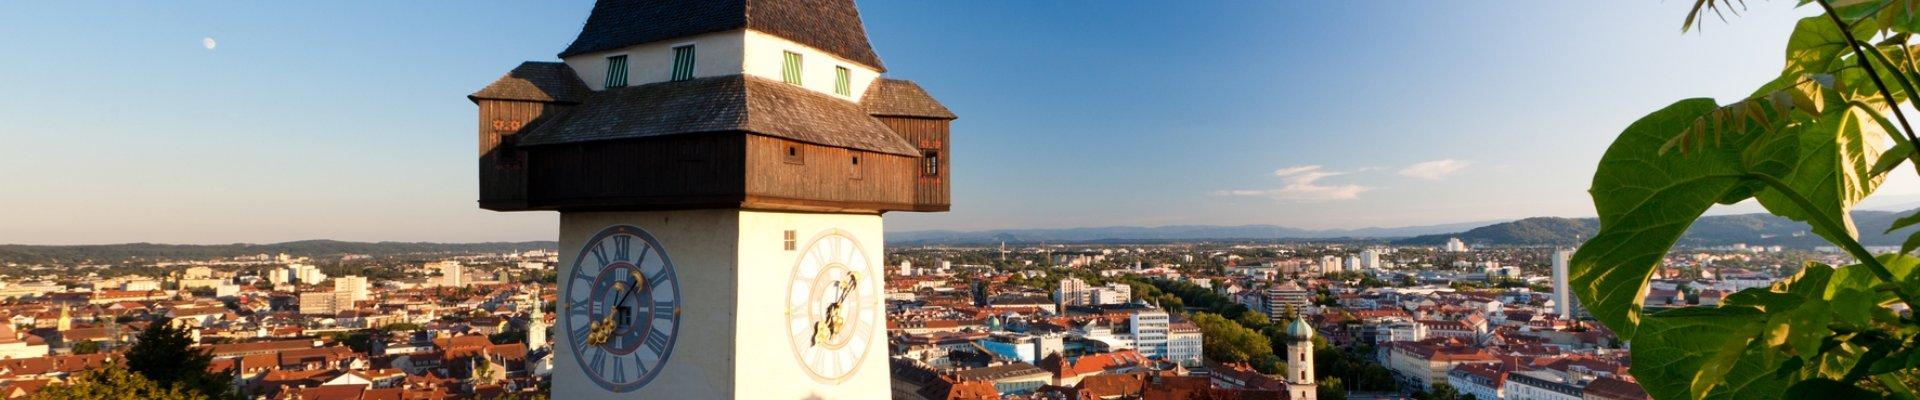 00000078851_Uhrturm-in-Graz_Graz-Tourismus_Harry-Schiffer.jpg